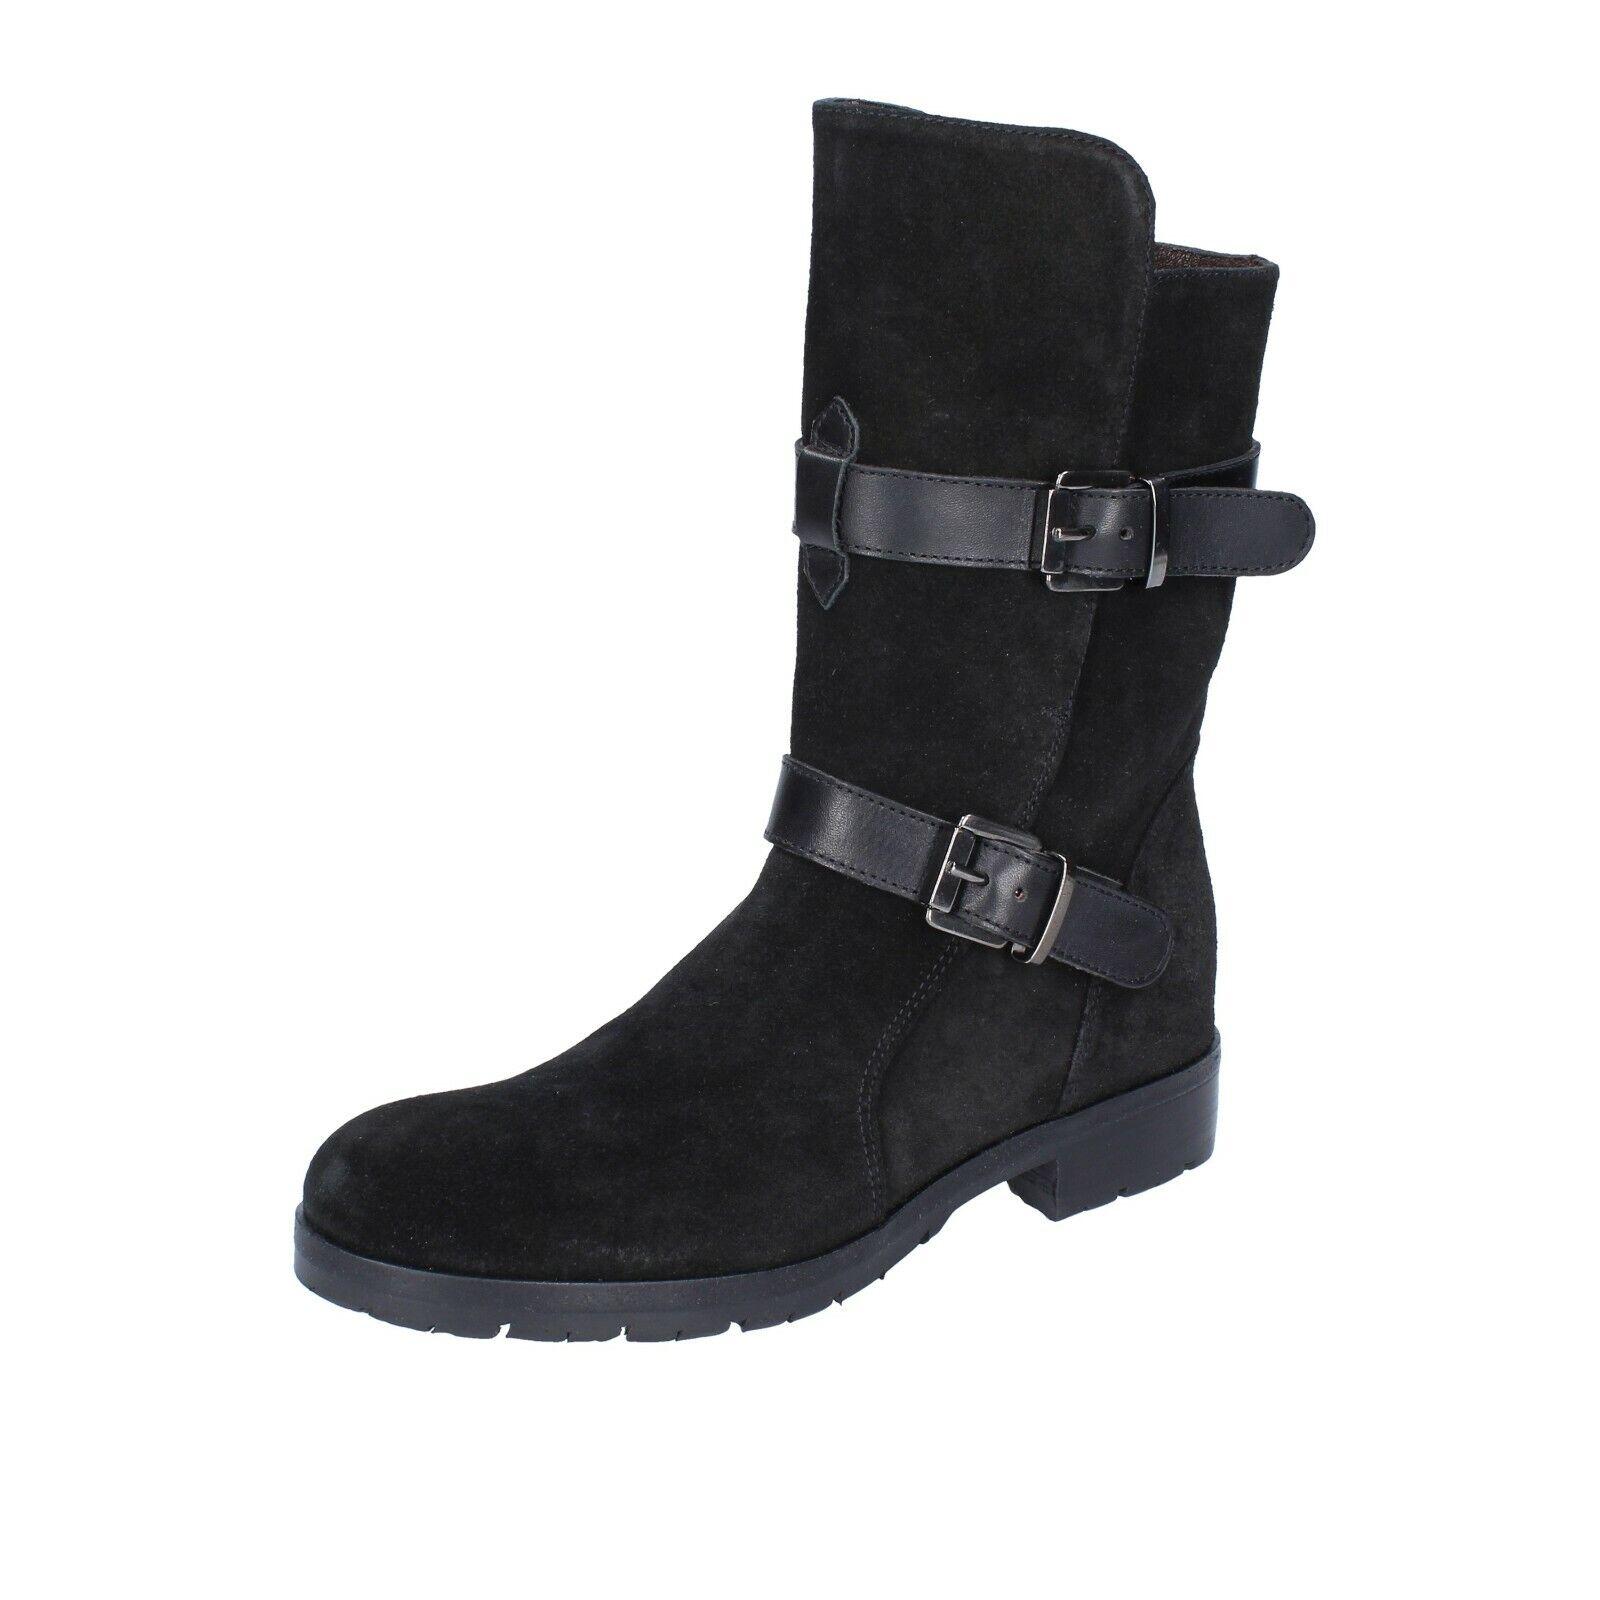 Chaussures Femmes TRIVER FLIGHT 38 UE bottines noir daim br206-38